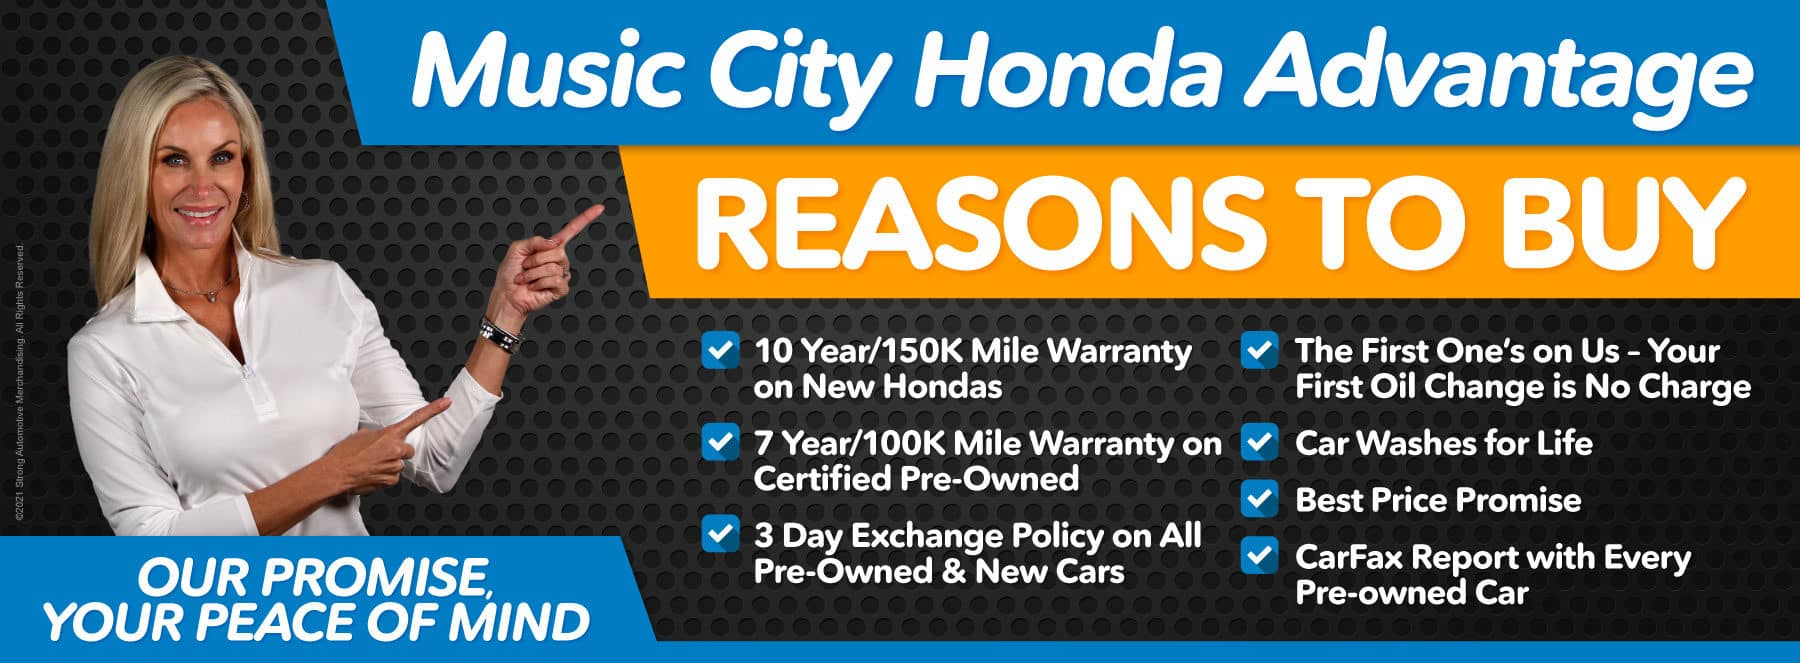 Music City Honda Advantage